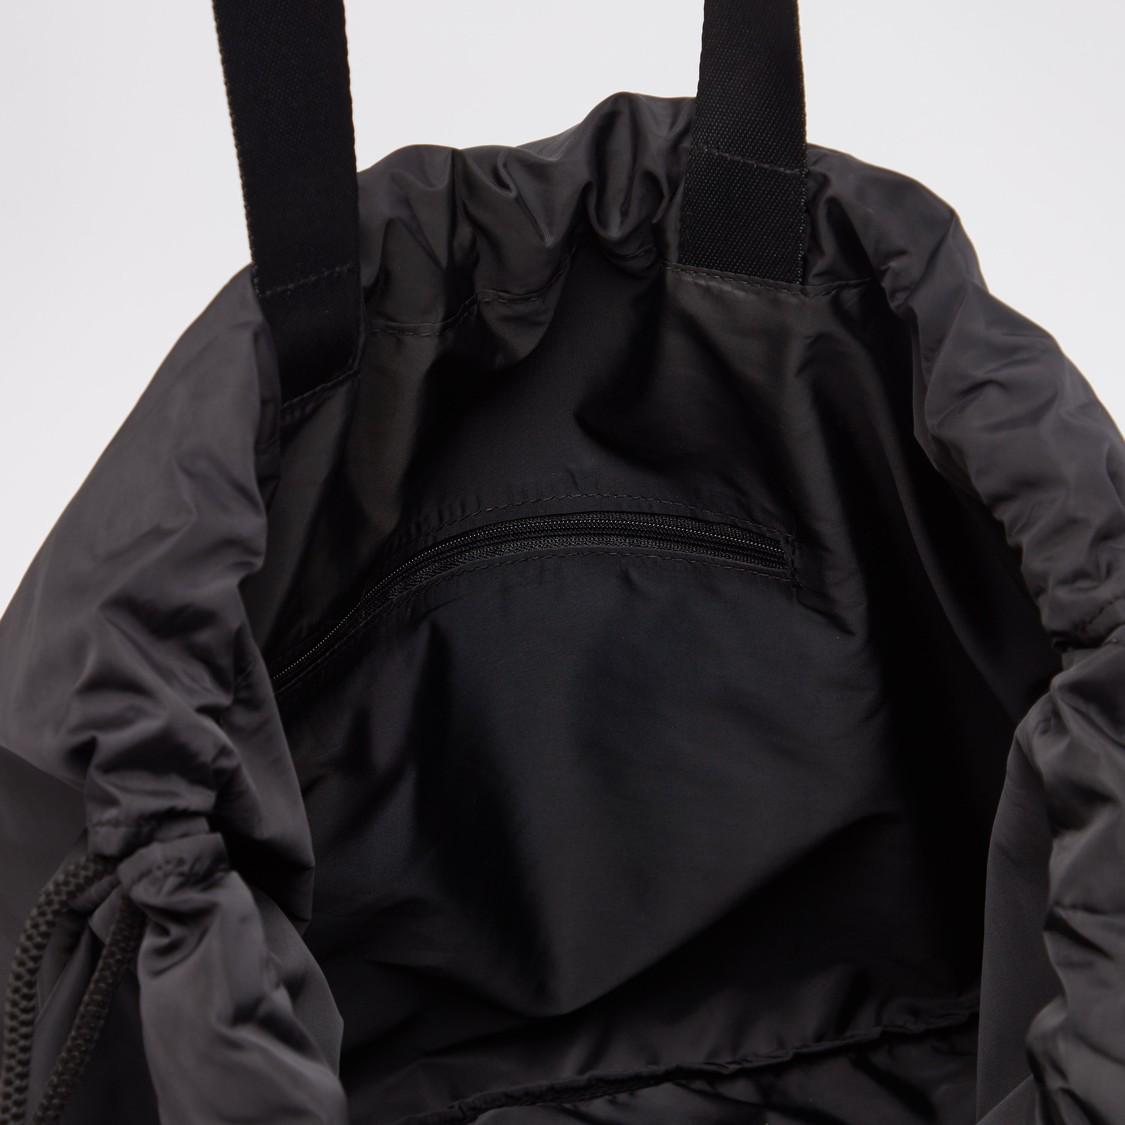 Text Print Gym Bag with Drawstring Closure